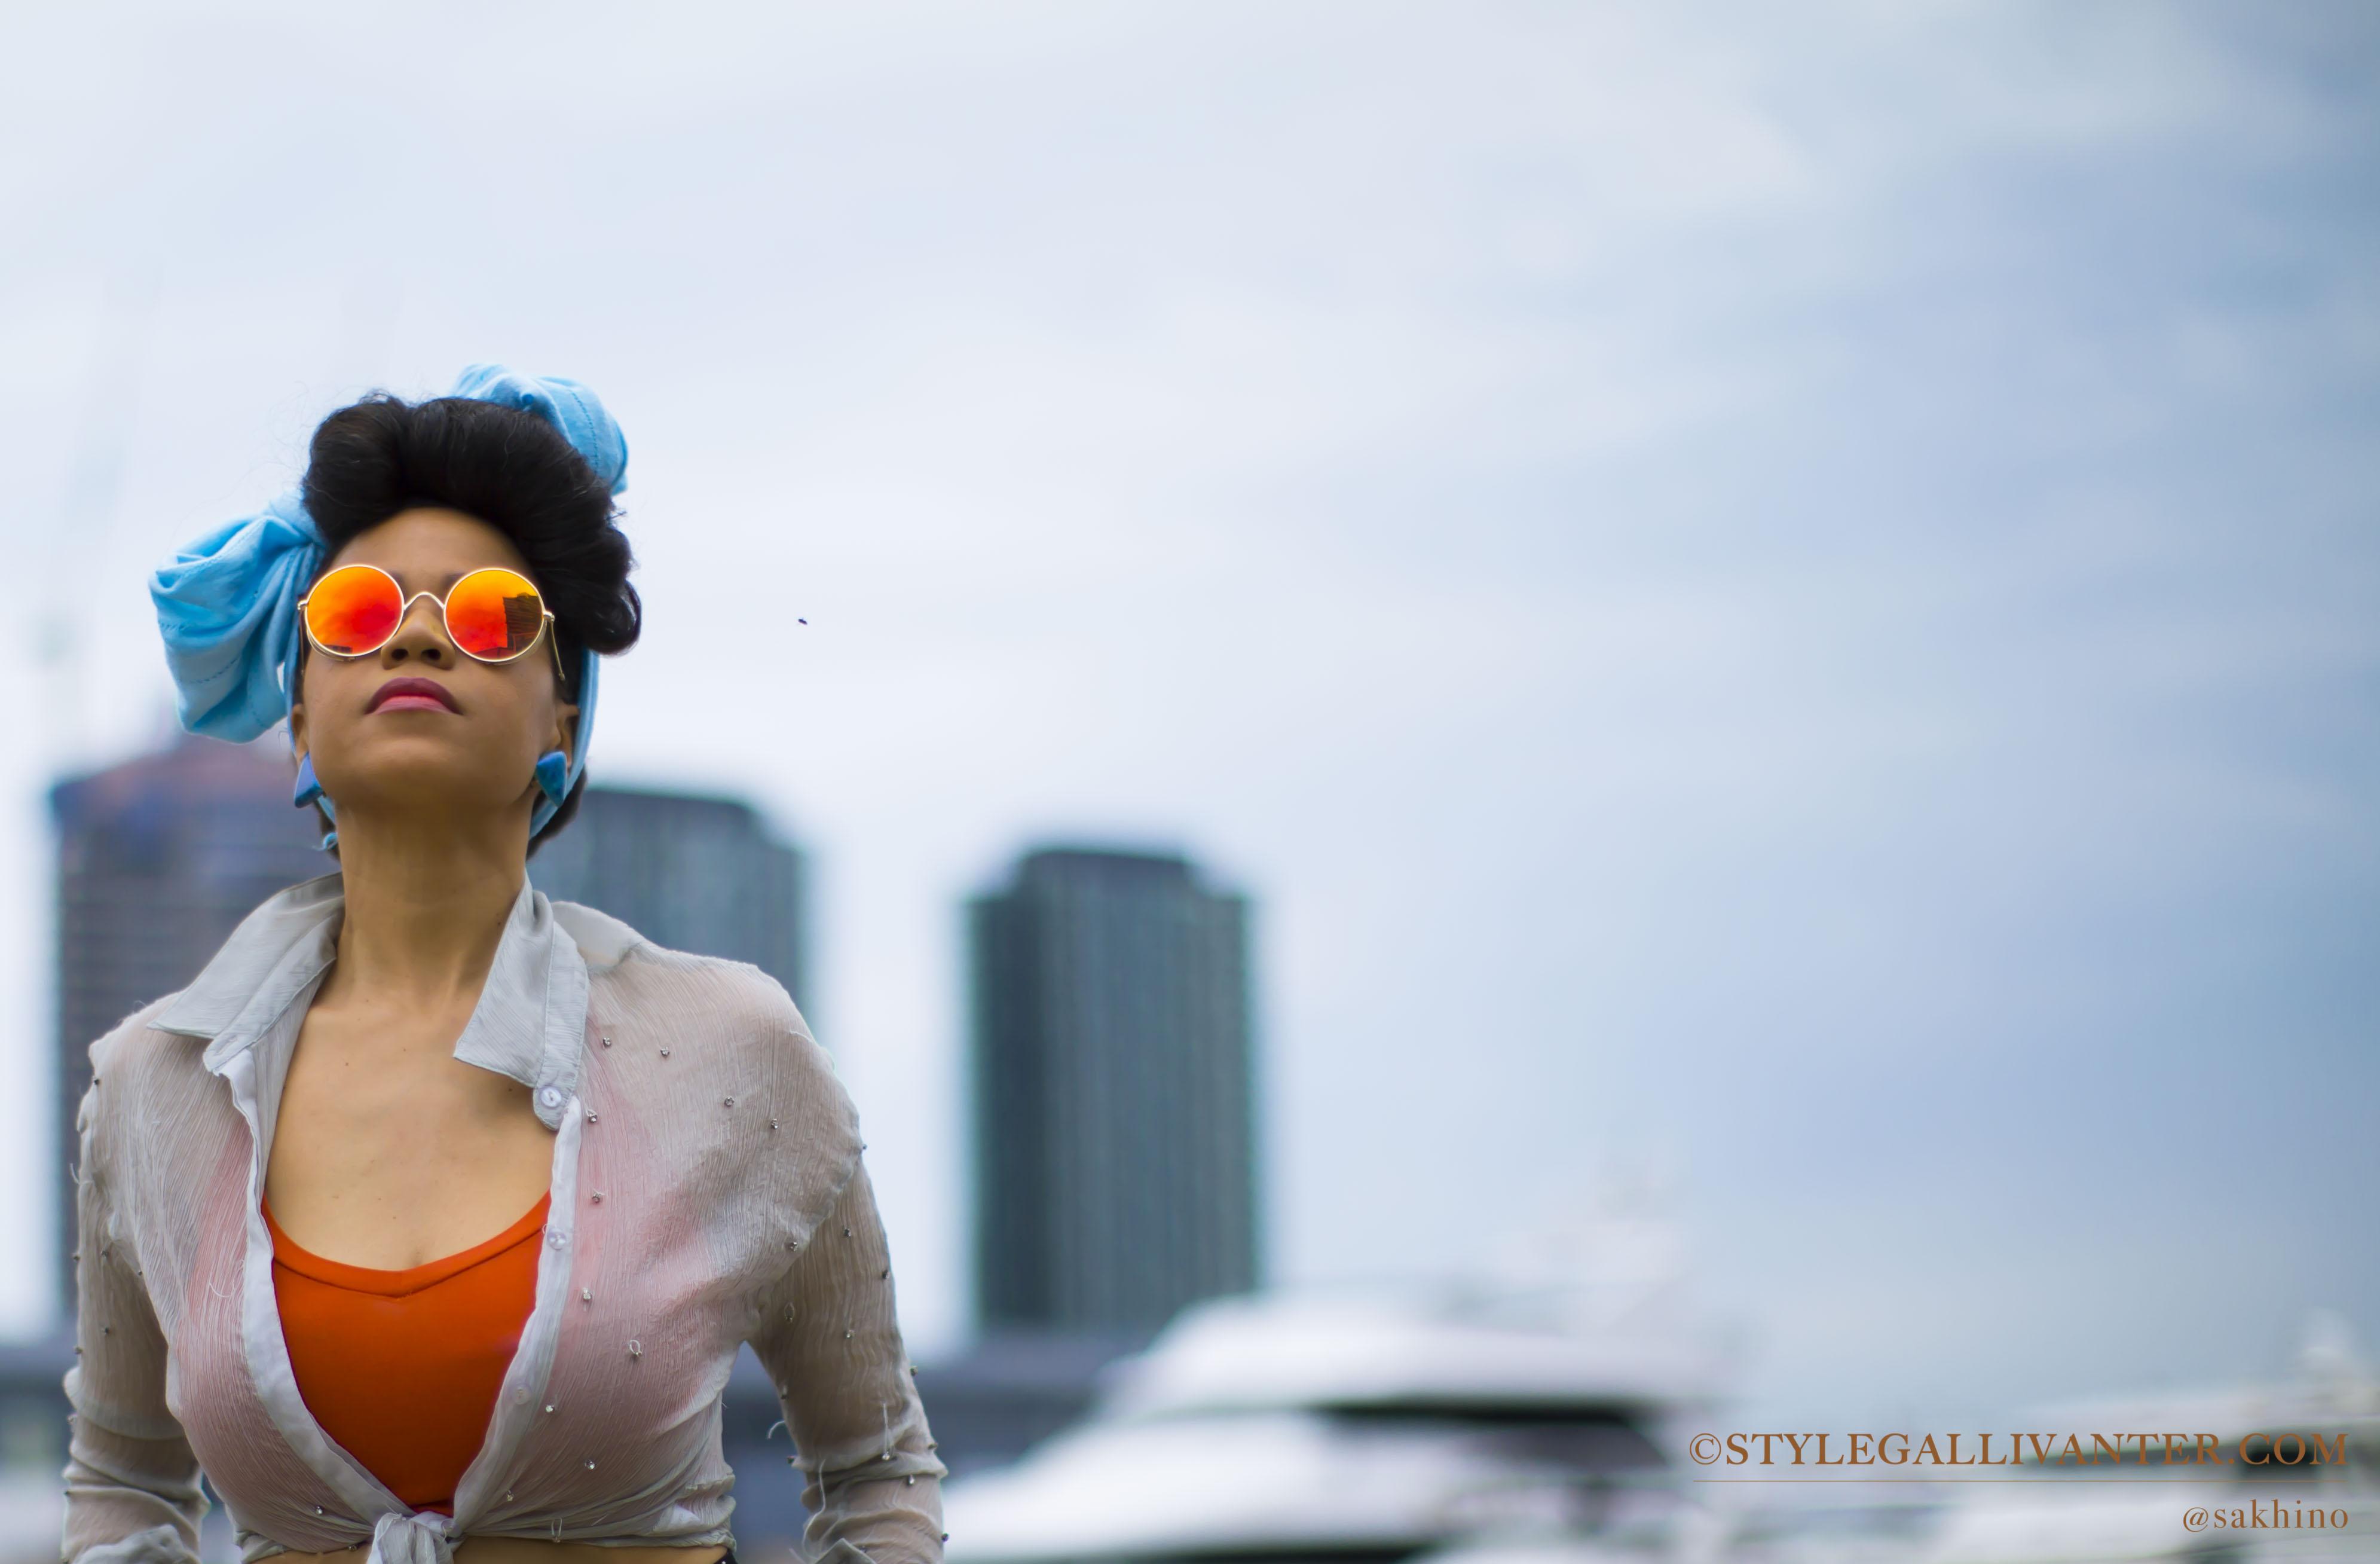 orange-sunglasses_top -australian-bloggers-2016_top-natural-hair-bloggers-2016_womens-trends-2016